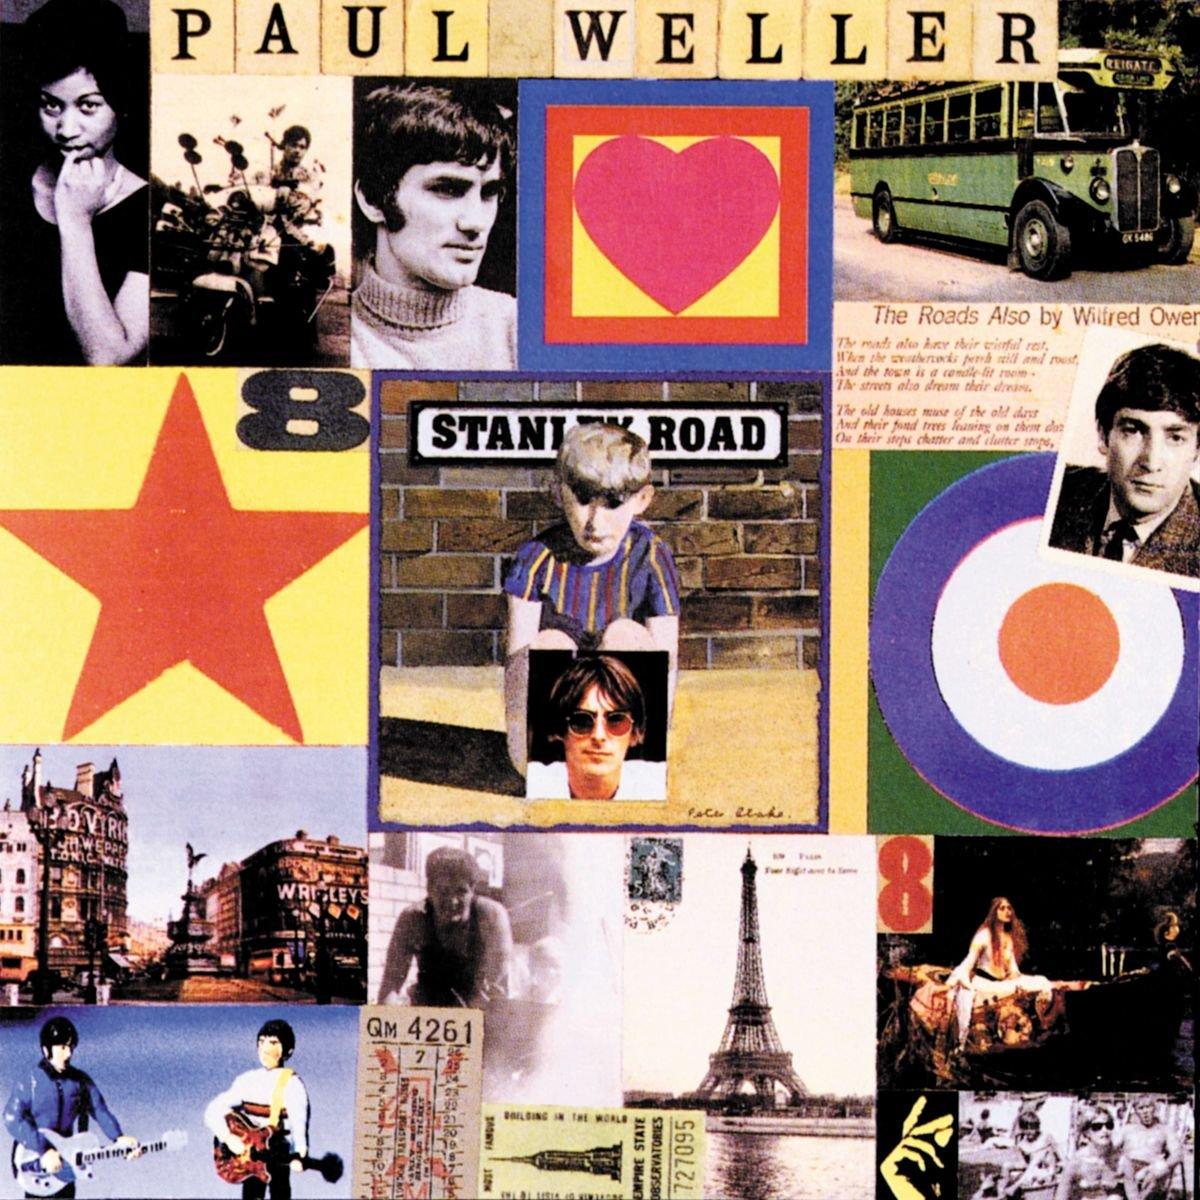 Vinilo : Paul Weller - Stanley Road (LP Vinyl)